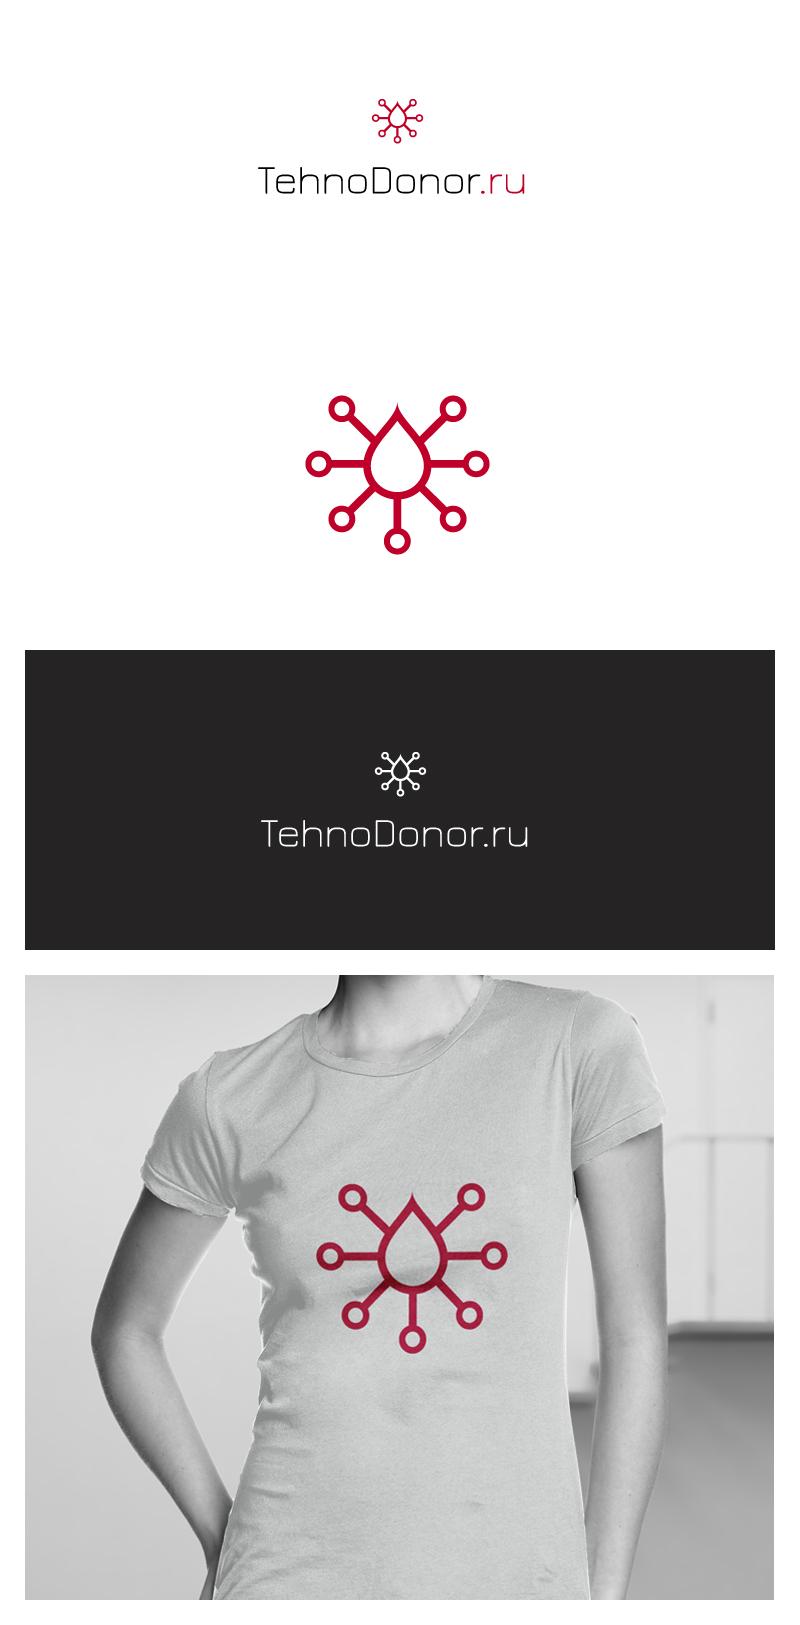 Tehnodonor.ru